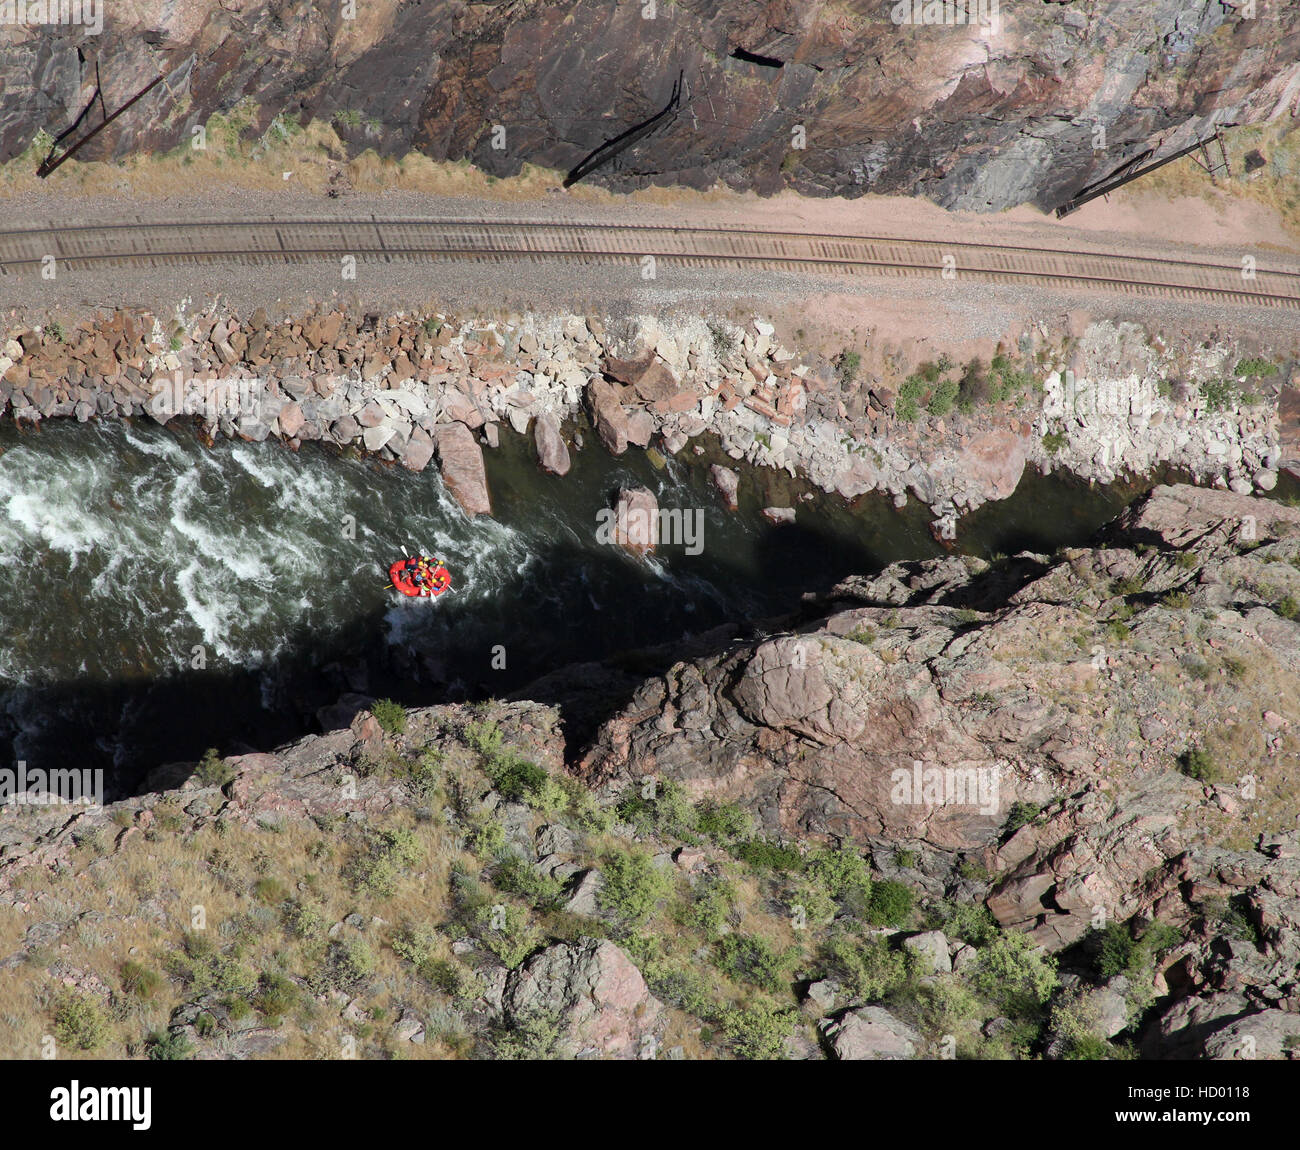 Shooting In Canon City Colorado: Royal Gorge Stock Photos & Royal Gorge Stock Images